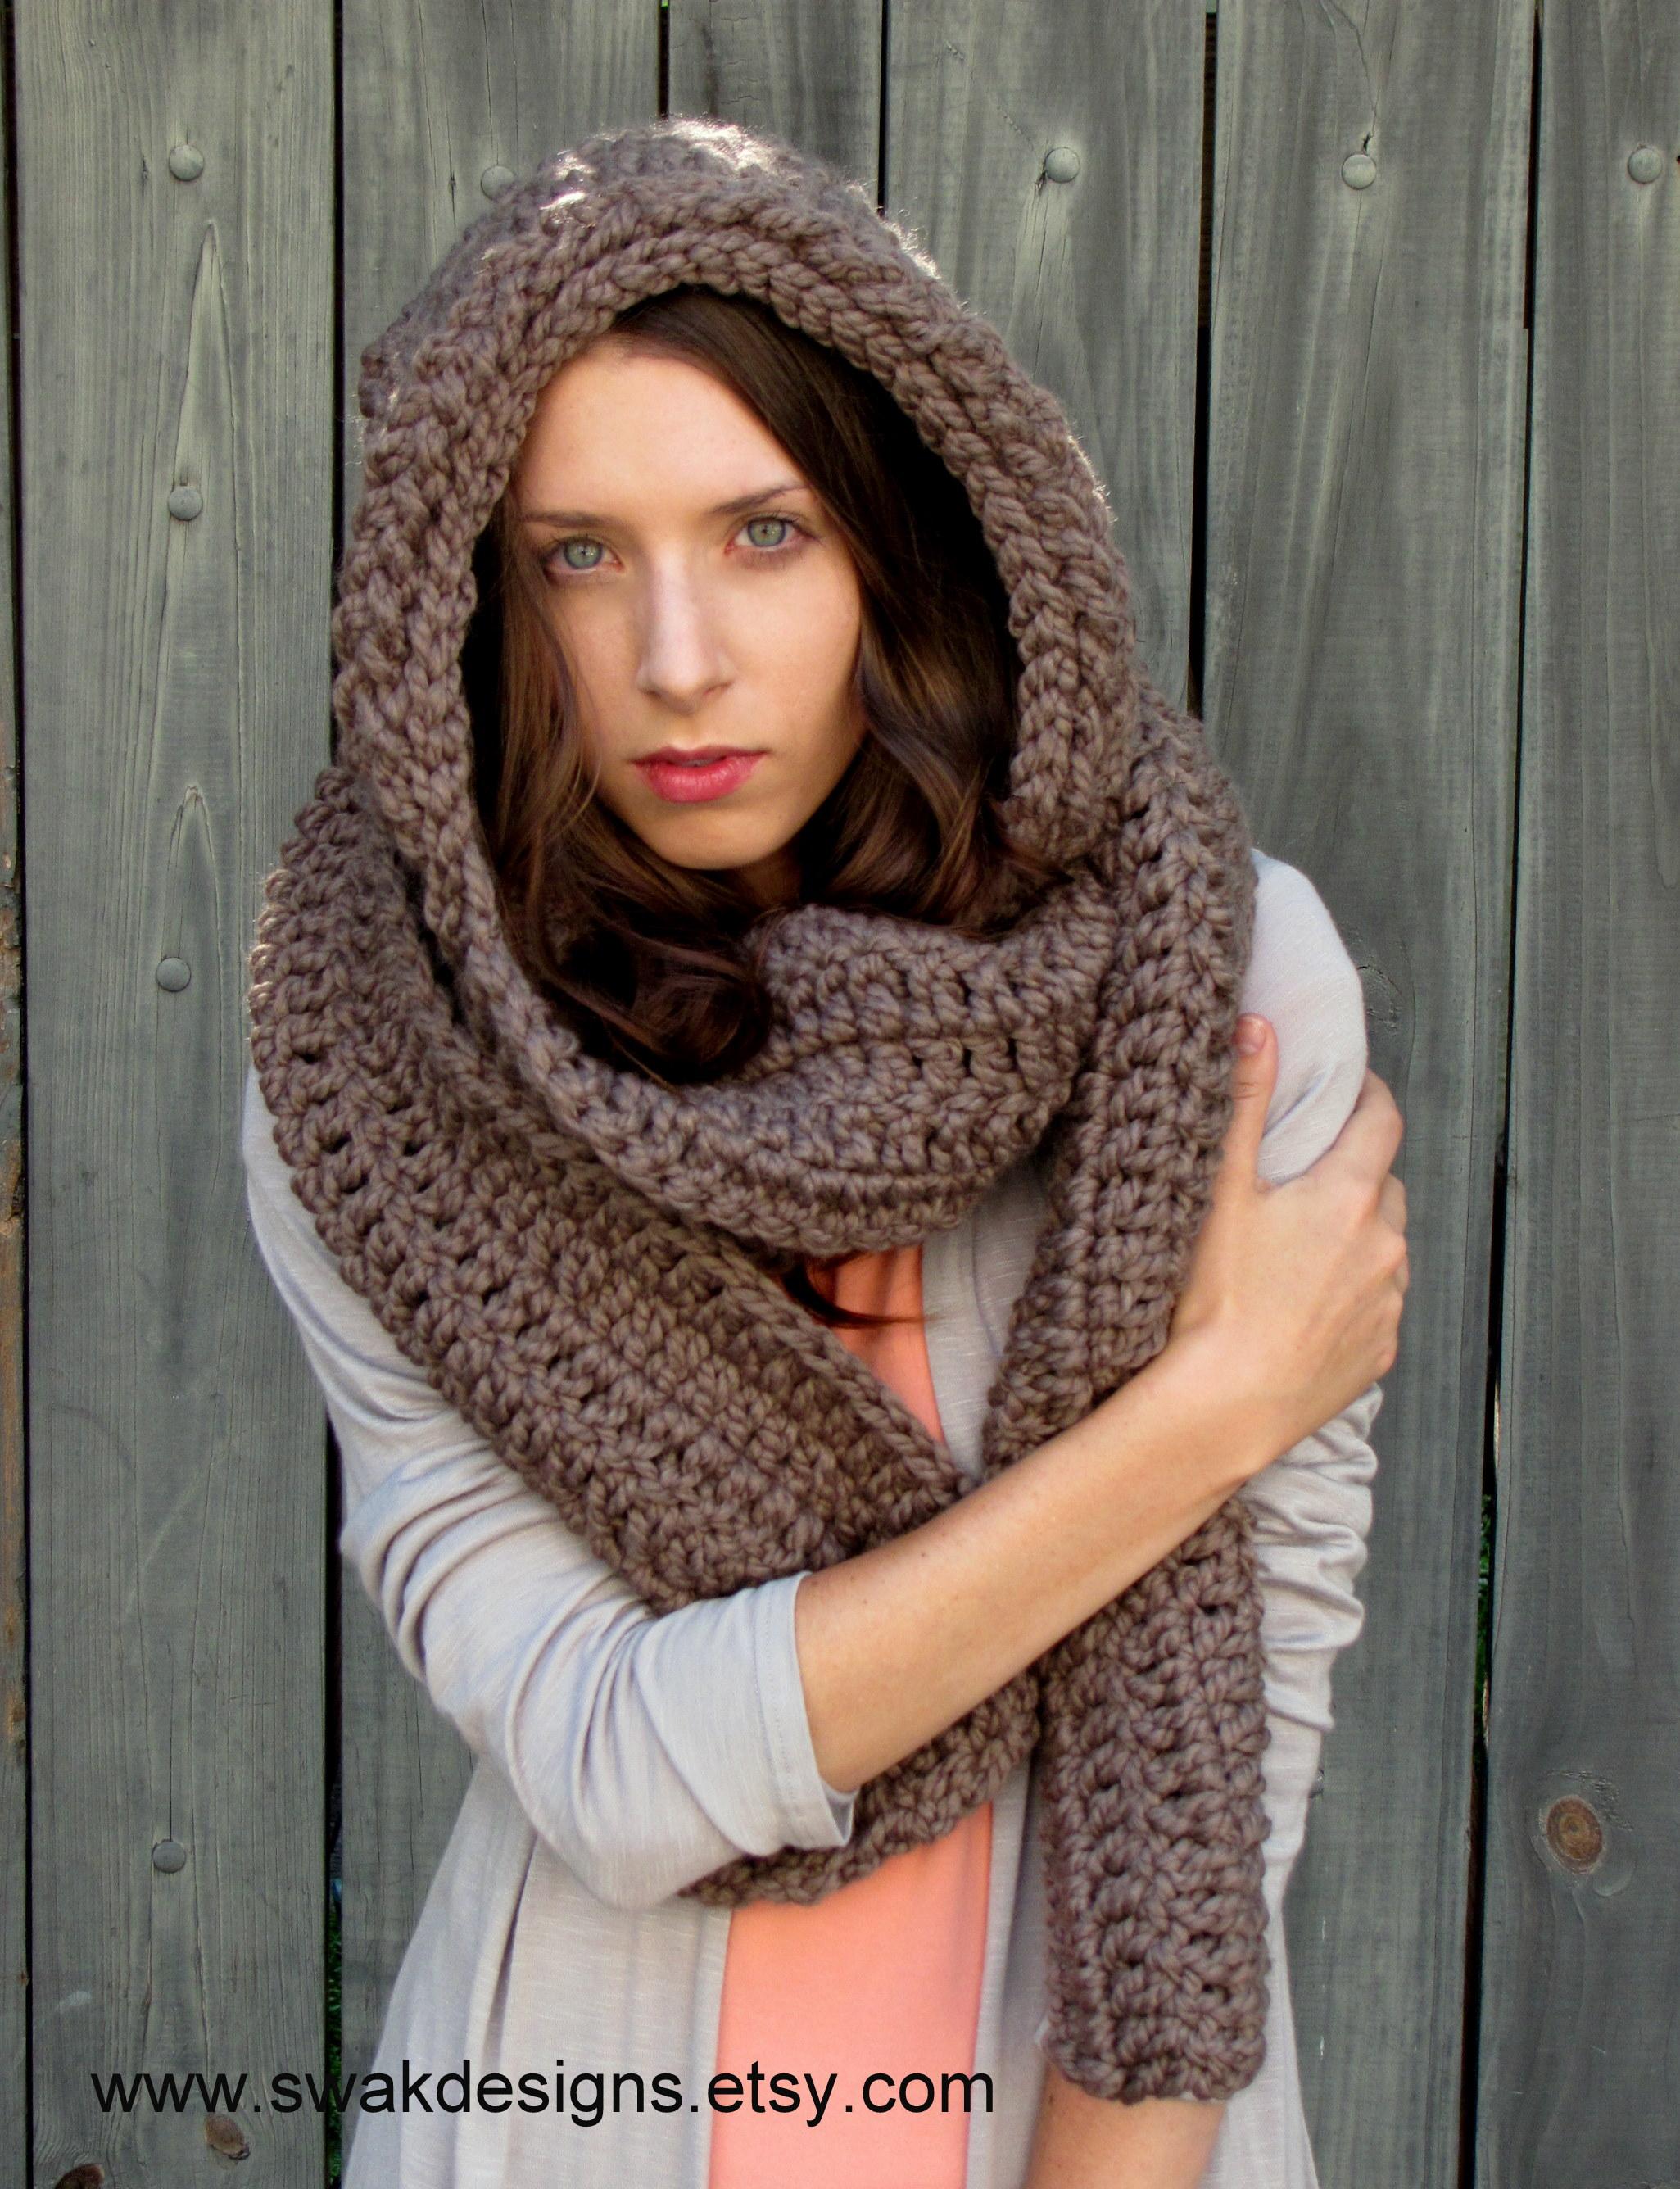 Oversized Hood Knitting Pattern : SWAKCouture Oversized Hooded Scarf, The Lofty Wool ...